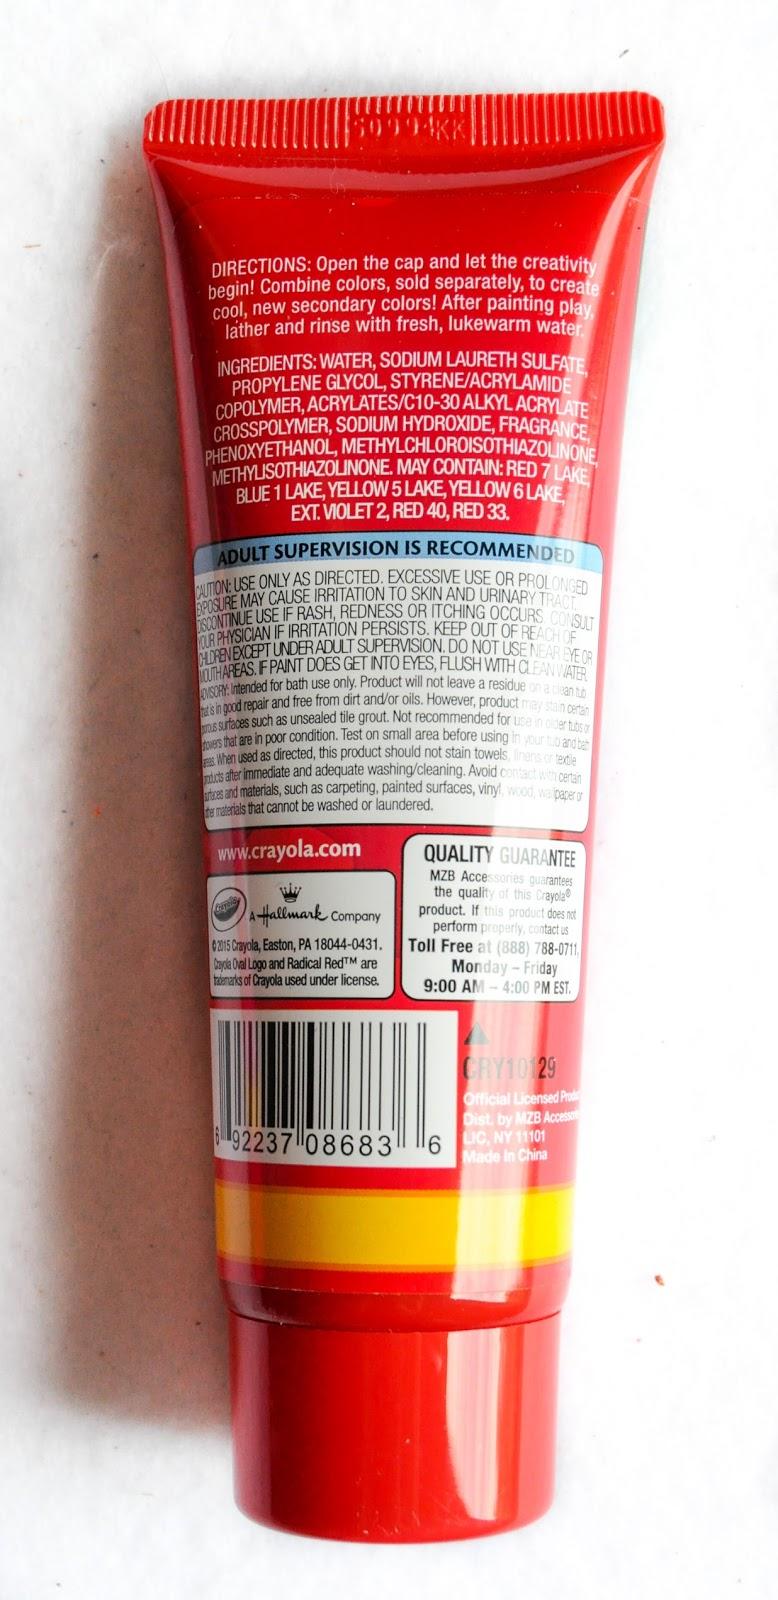 Crayola Bathtub Fingerpaint Soap And Crayola Body Wash